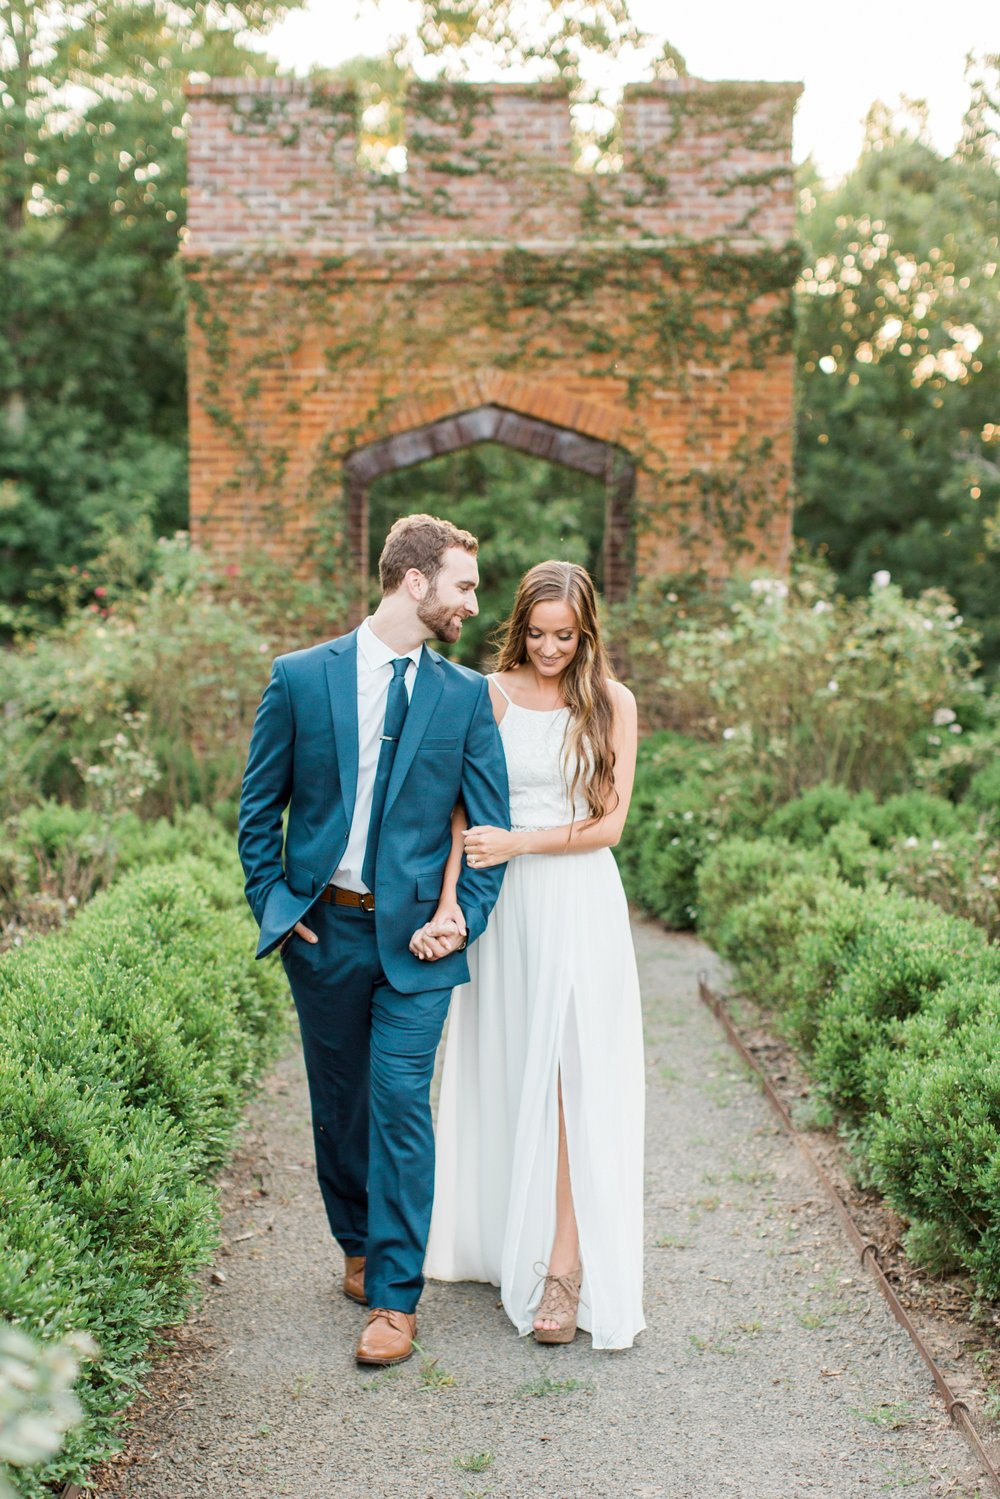 Moss Mountain Farms Wedding Arkansas_0170.jpg